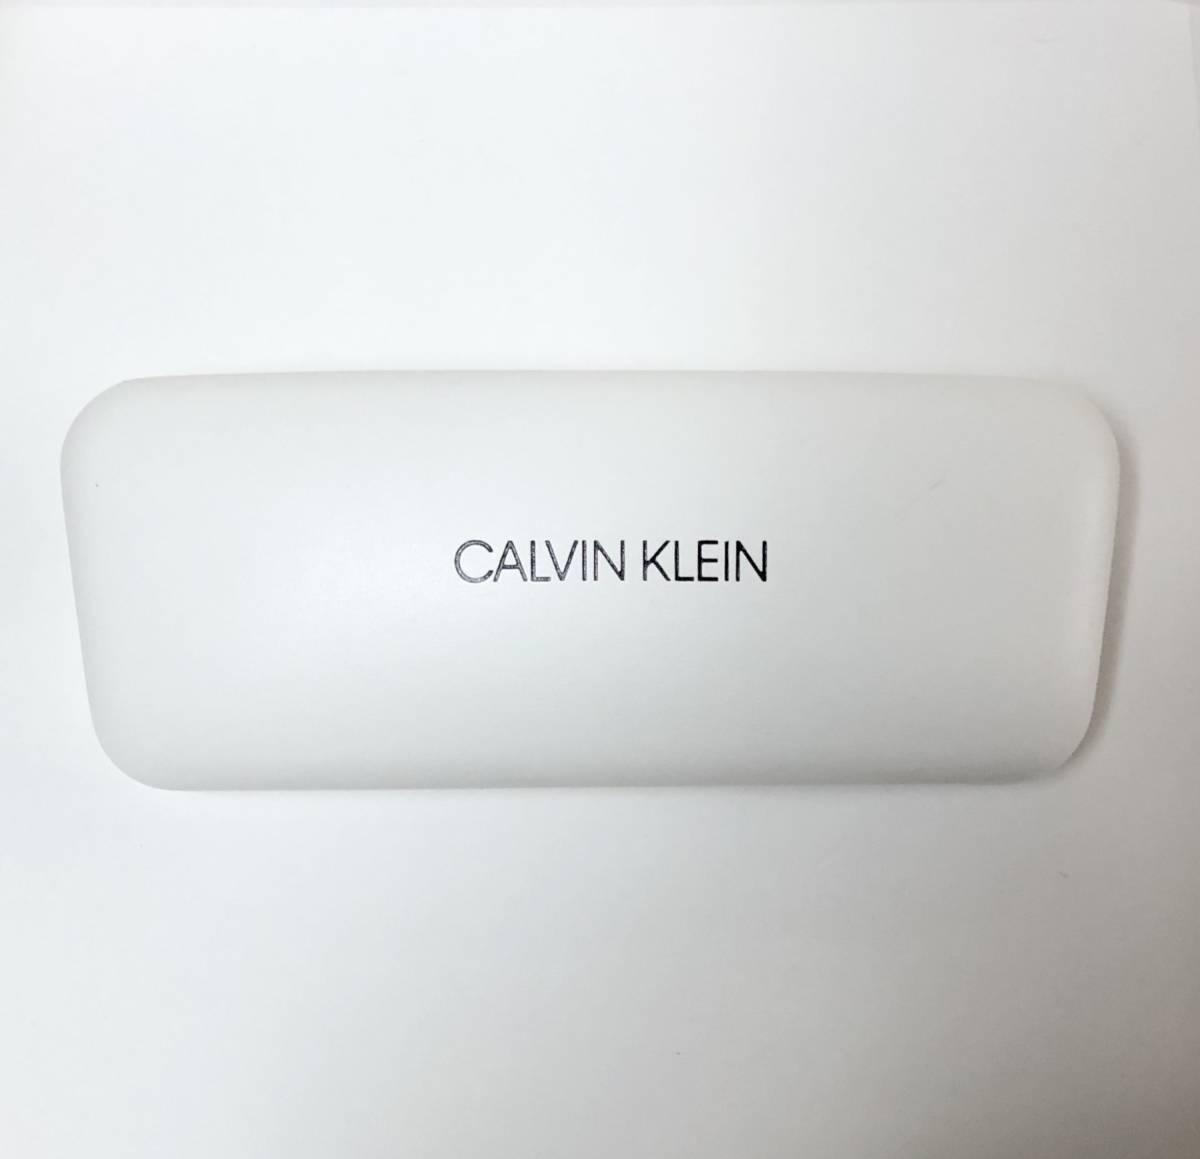 CK カルバンクライン 芸術的なサングラス イタリア製 純正・新品 ケース付き 米国ブランド Calvin Klein メガネ可能_画像10